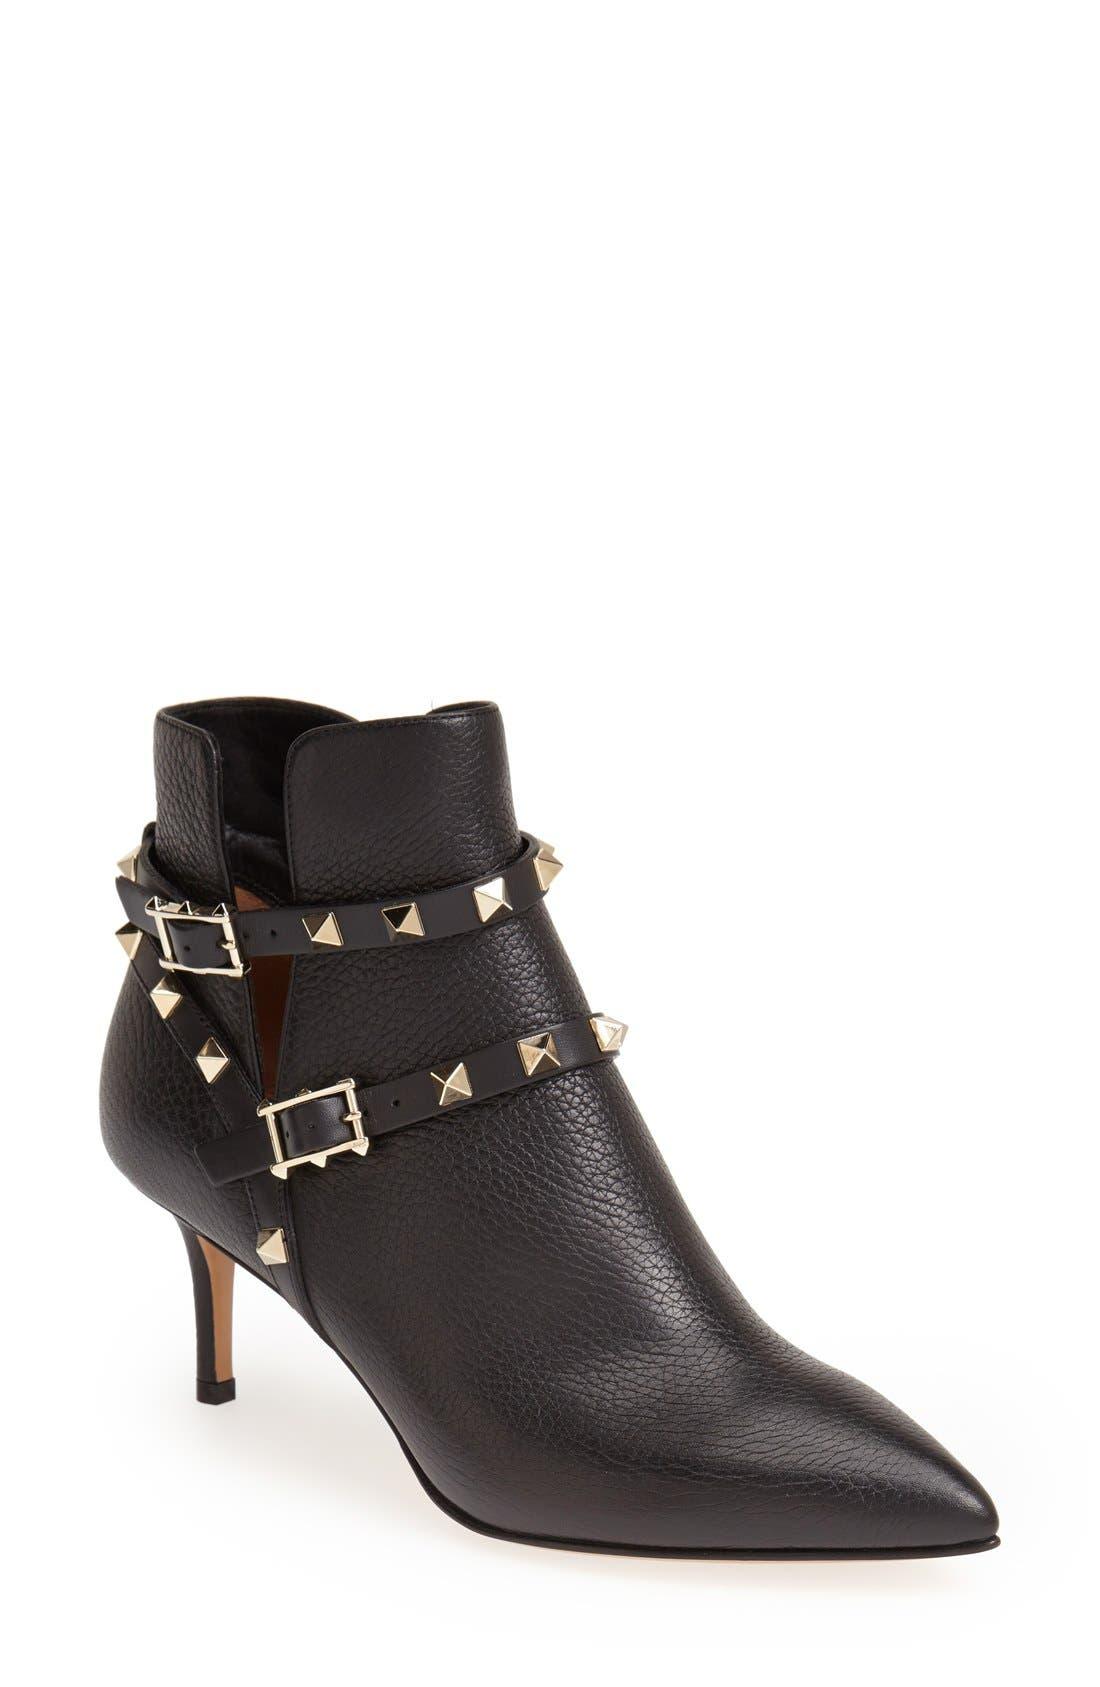 Main Image - Valentino 'Rockstud' Pointy Toe Calfskin Leather Bootie (Women)